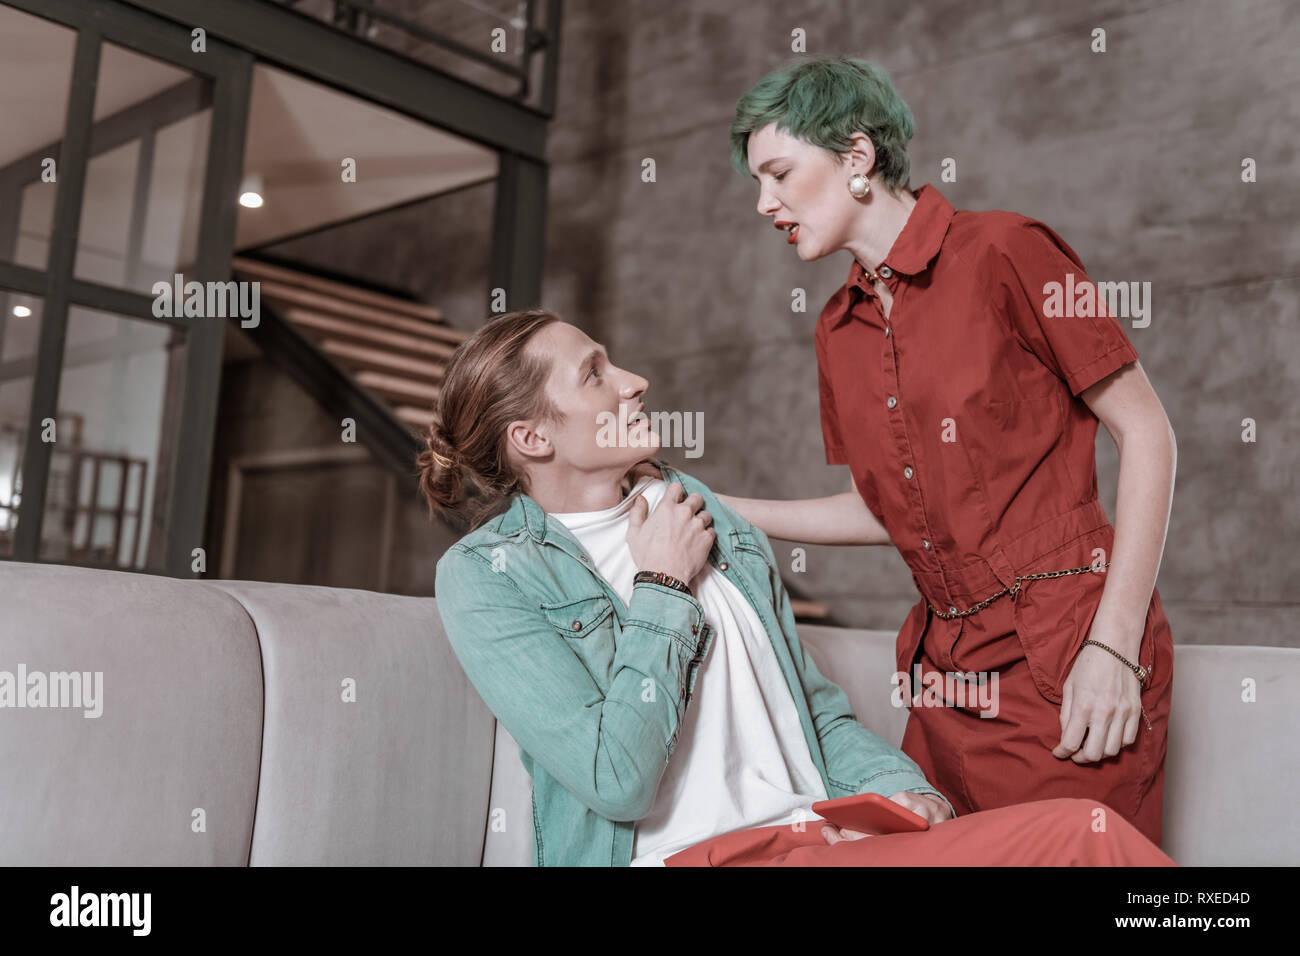 Girlfriend feeling jealous pushing her boyfriend cheating on her - Stock Image